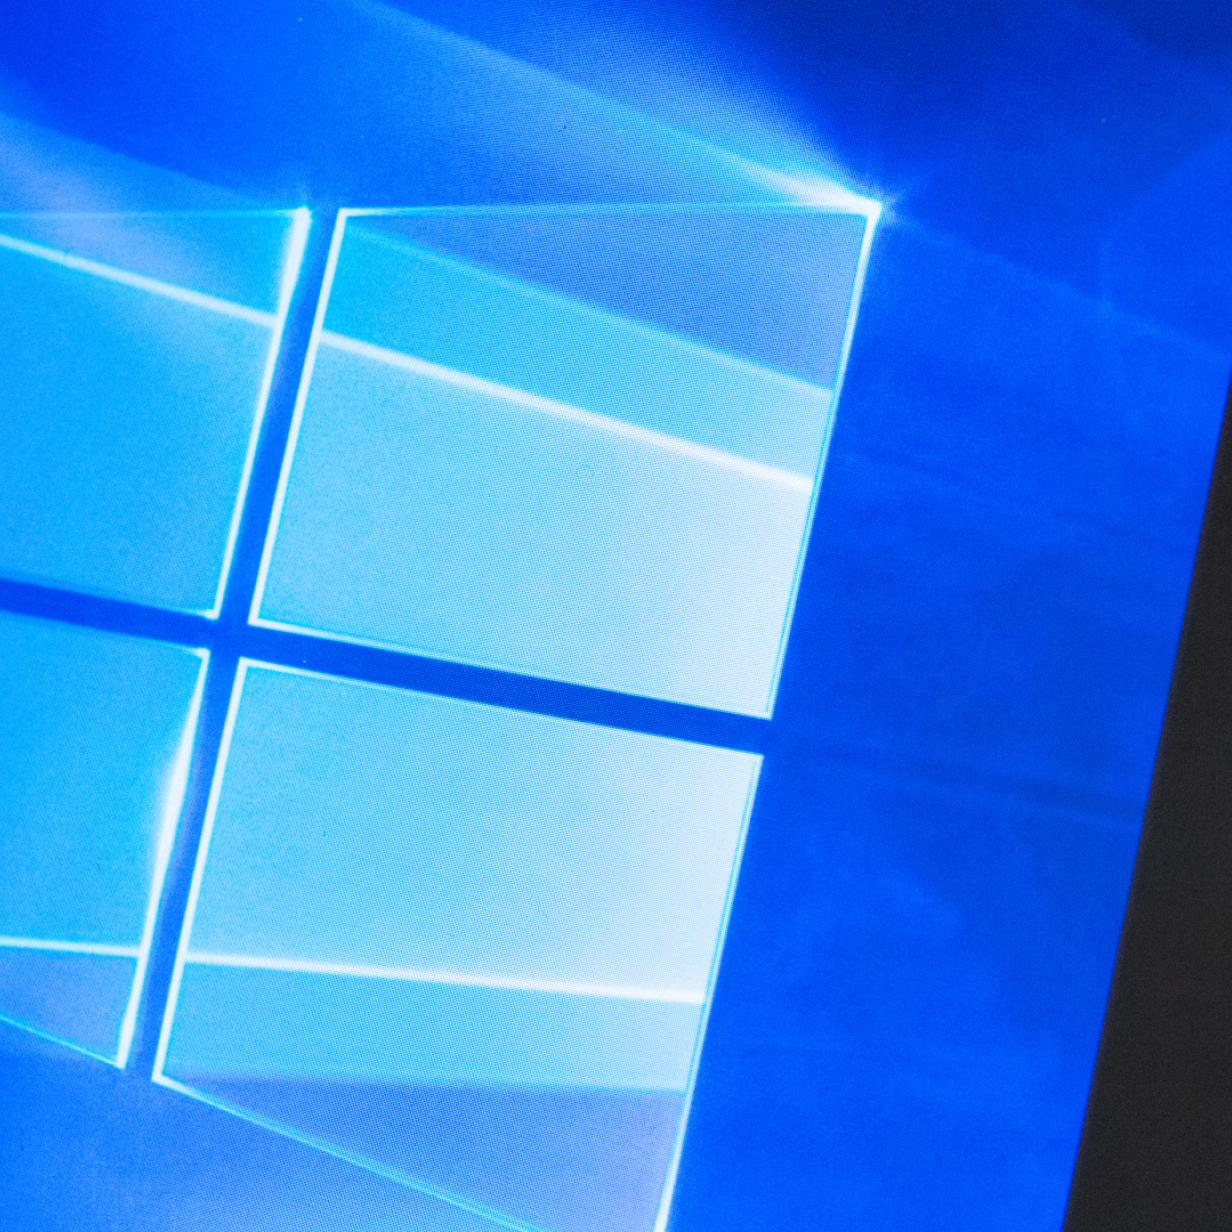 Microsoft warnt vor kuriosem Windows-10-Bug